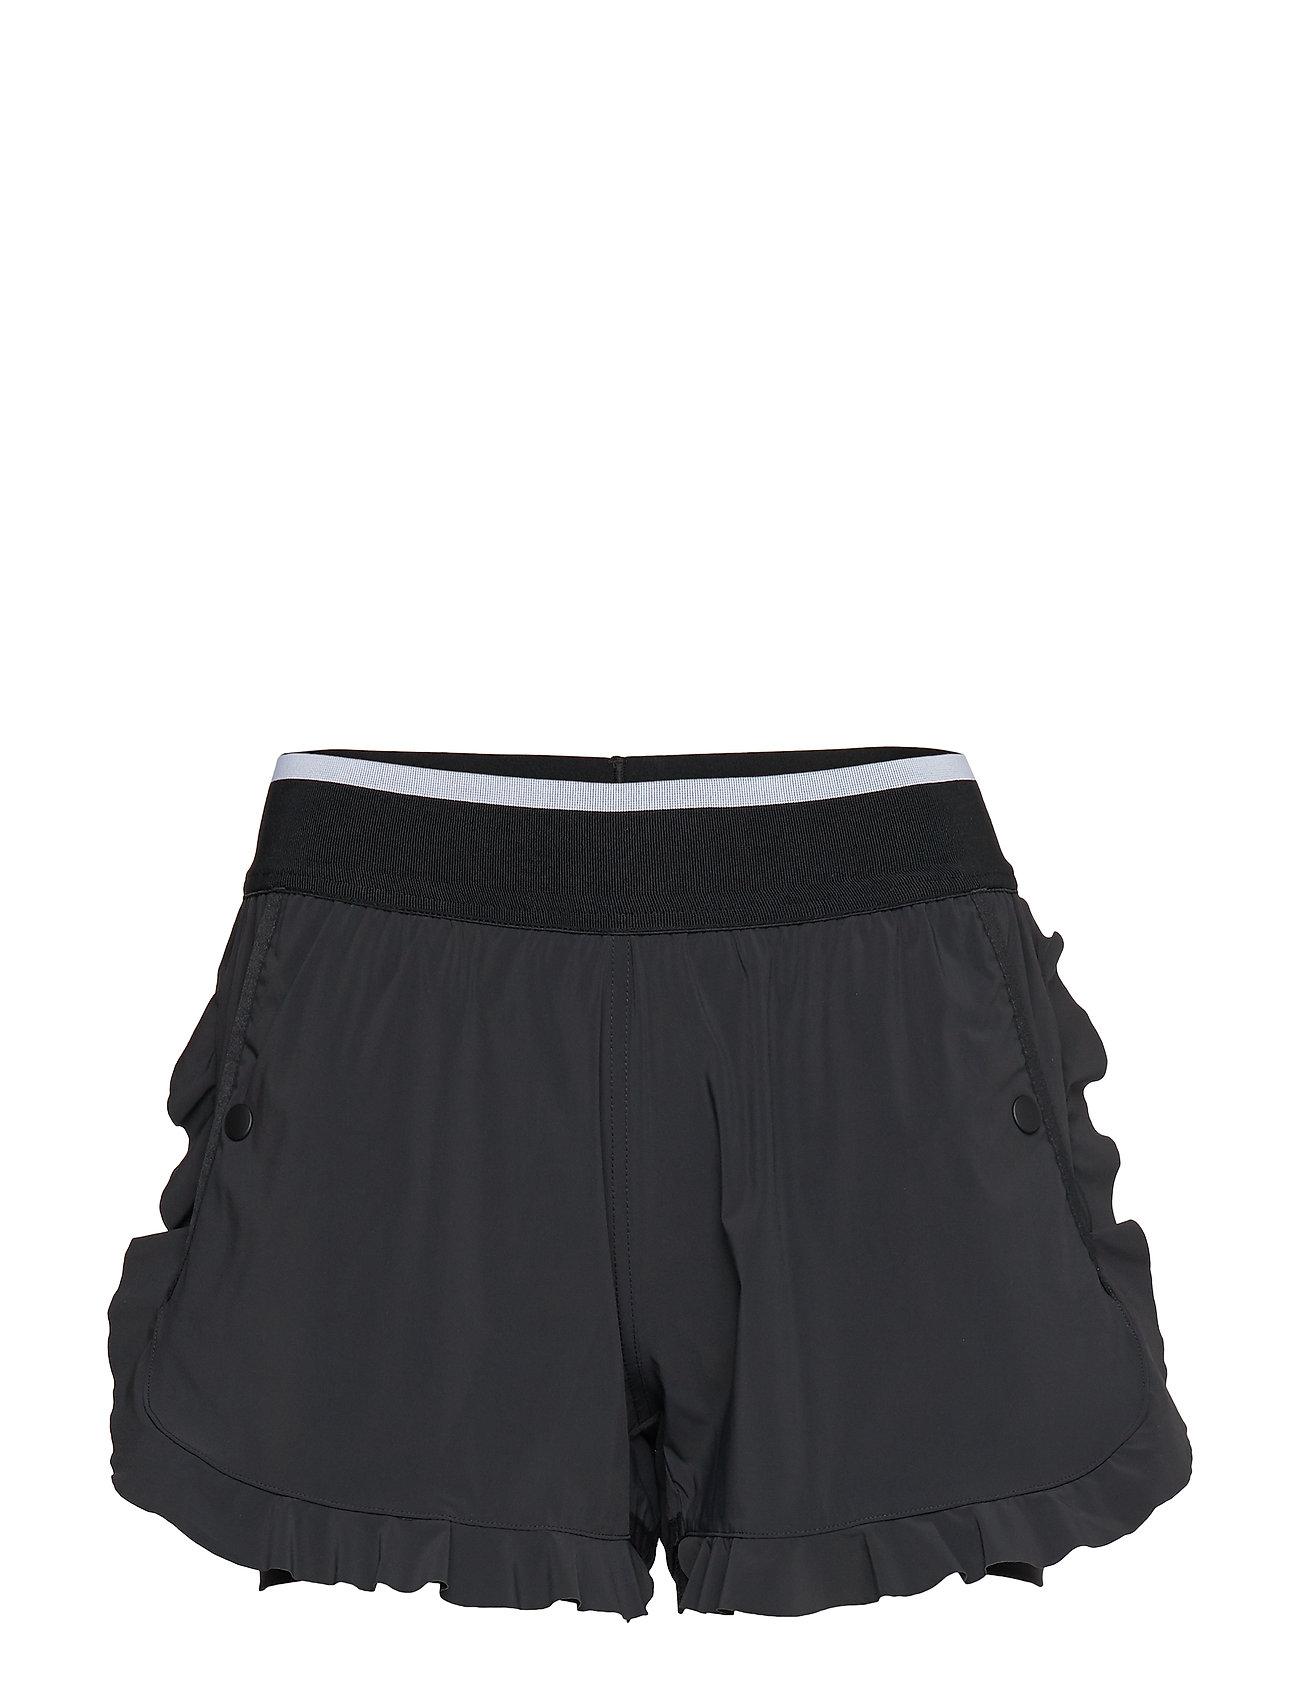 Hiit Short (Black) (524.30 kr) adidas by Stella McCartney